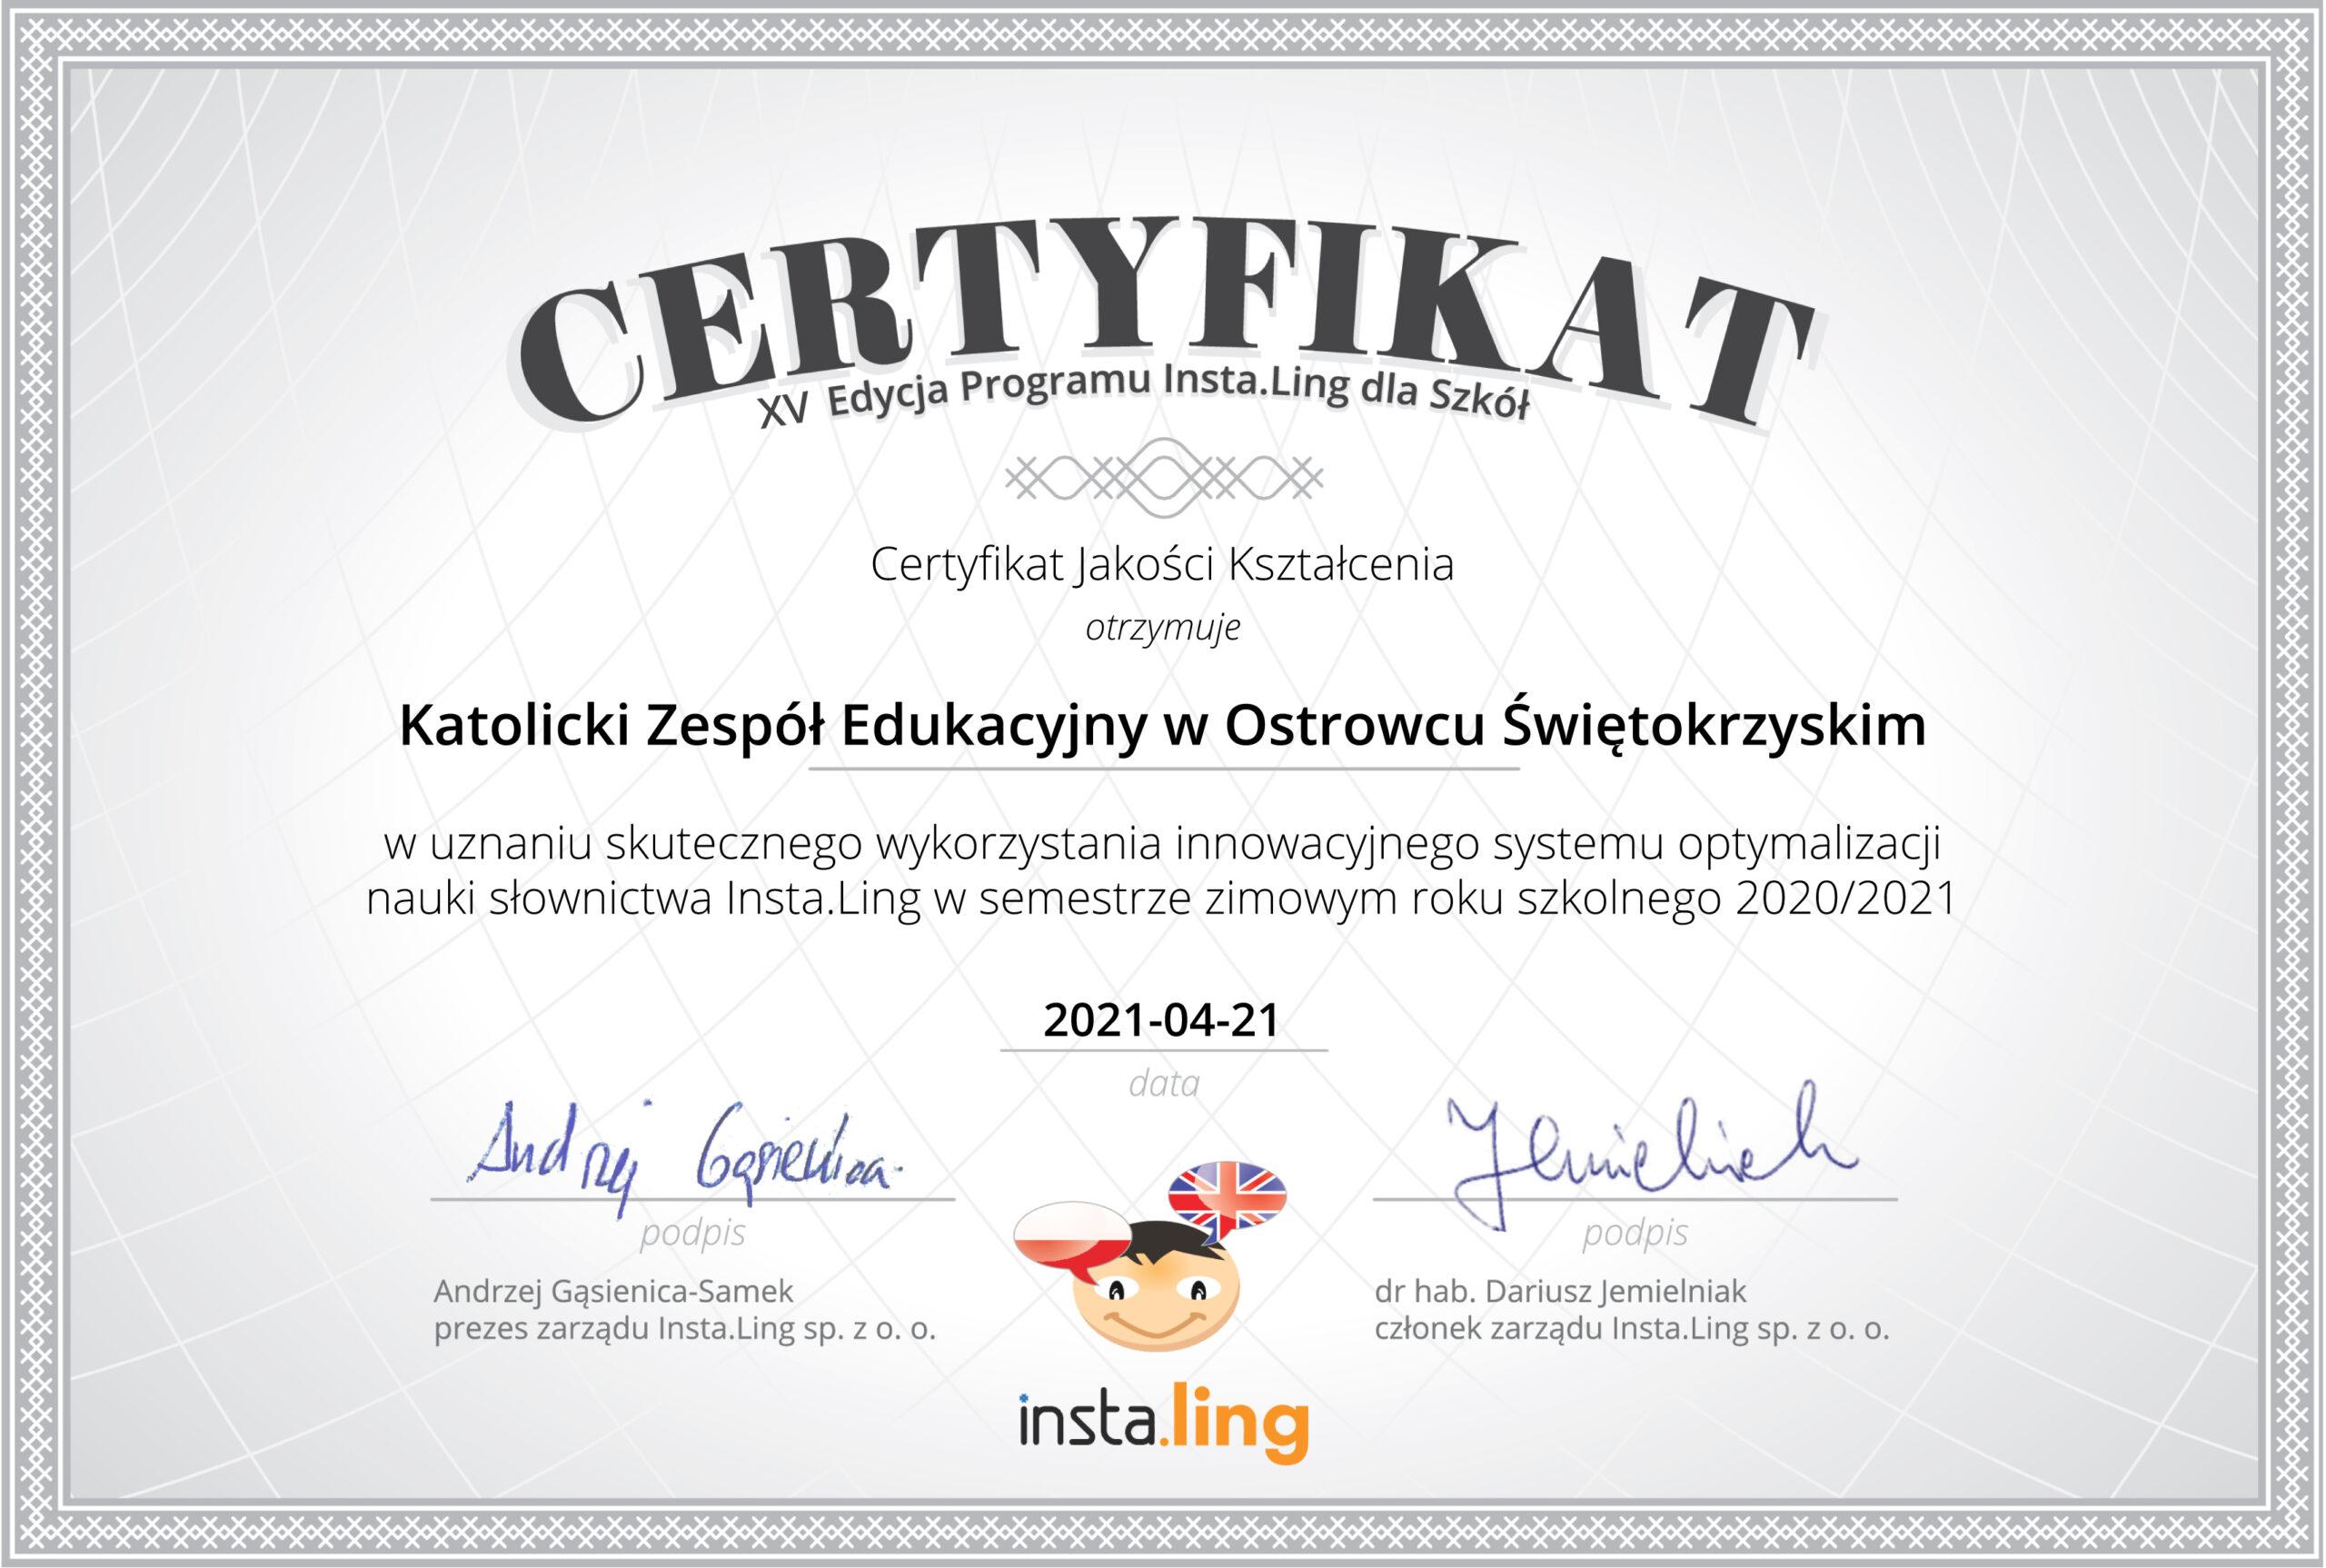 Instaling - certyfikat